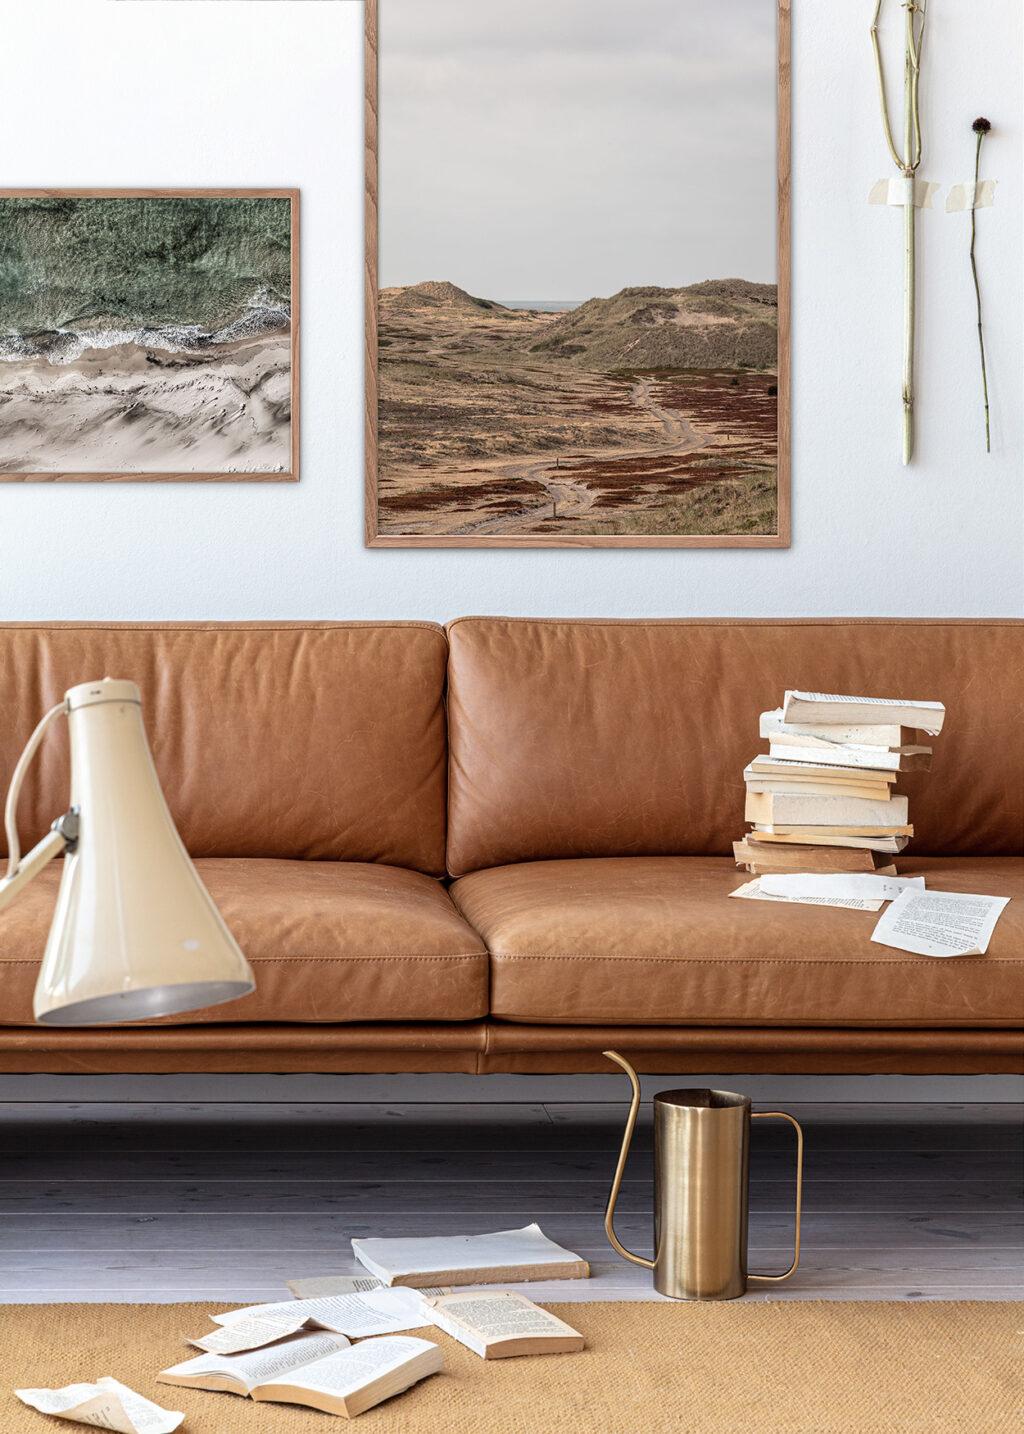 Danish Design Photography